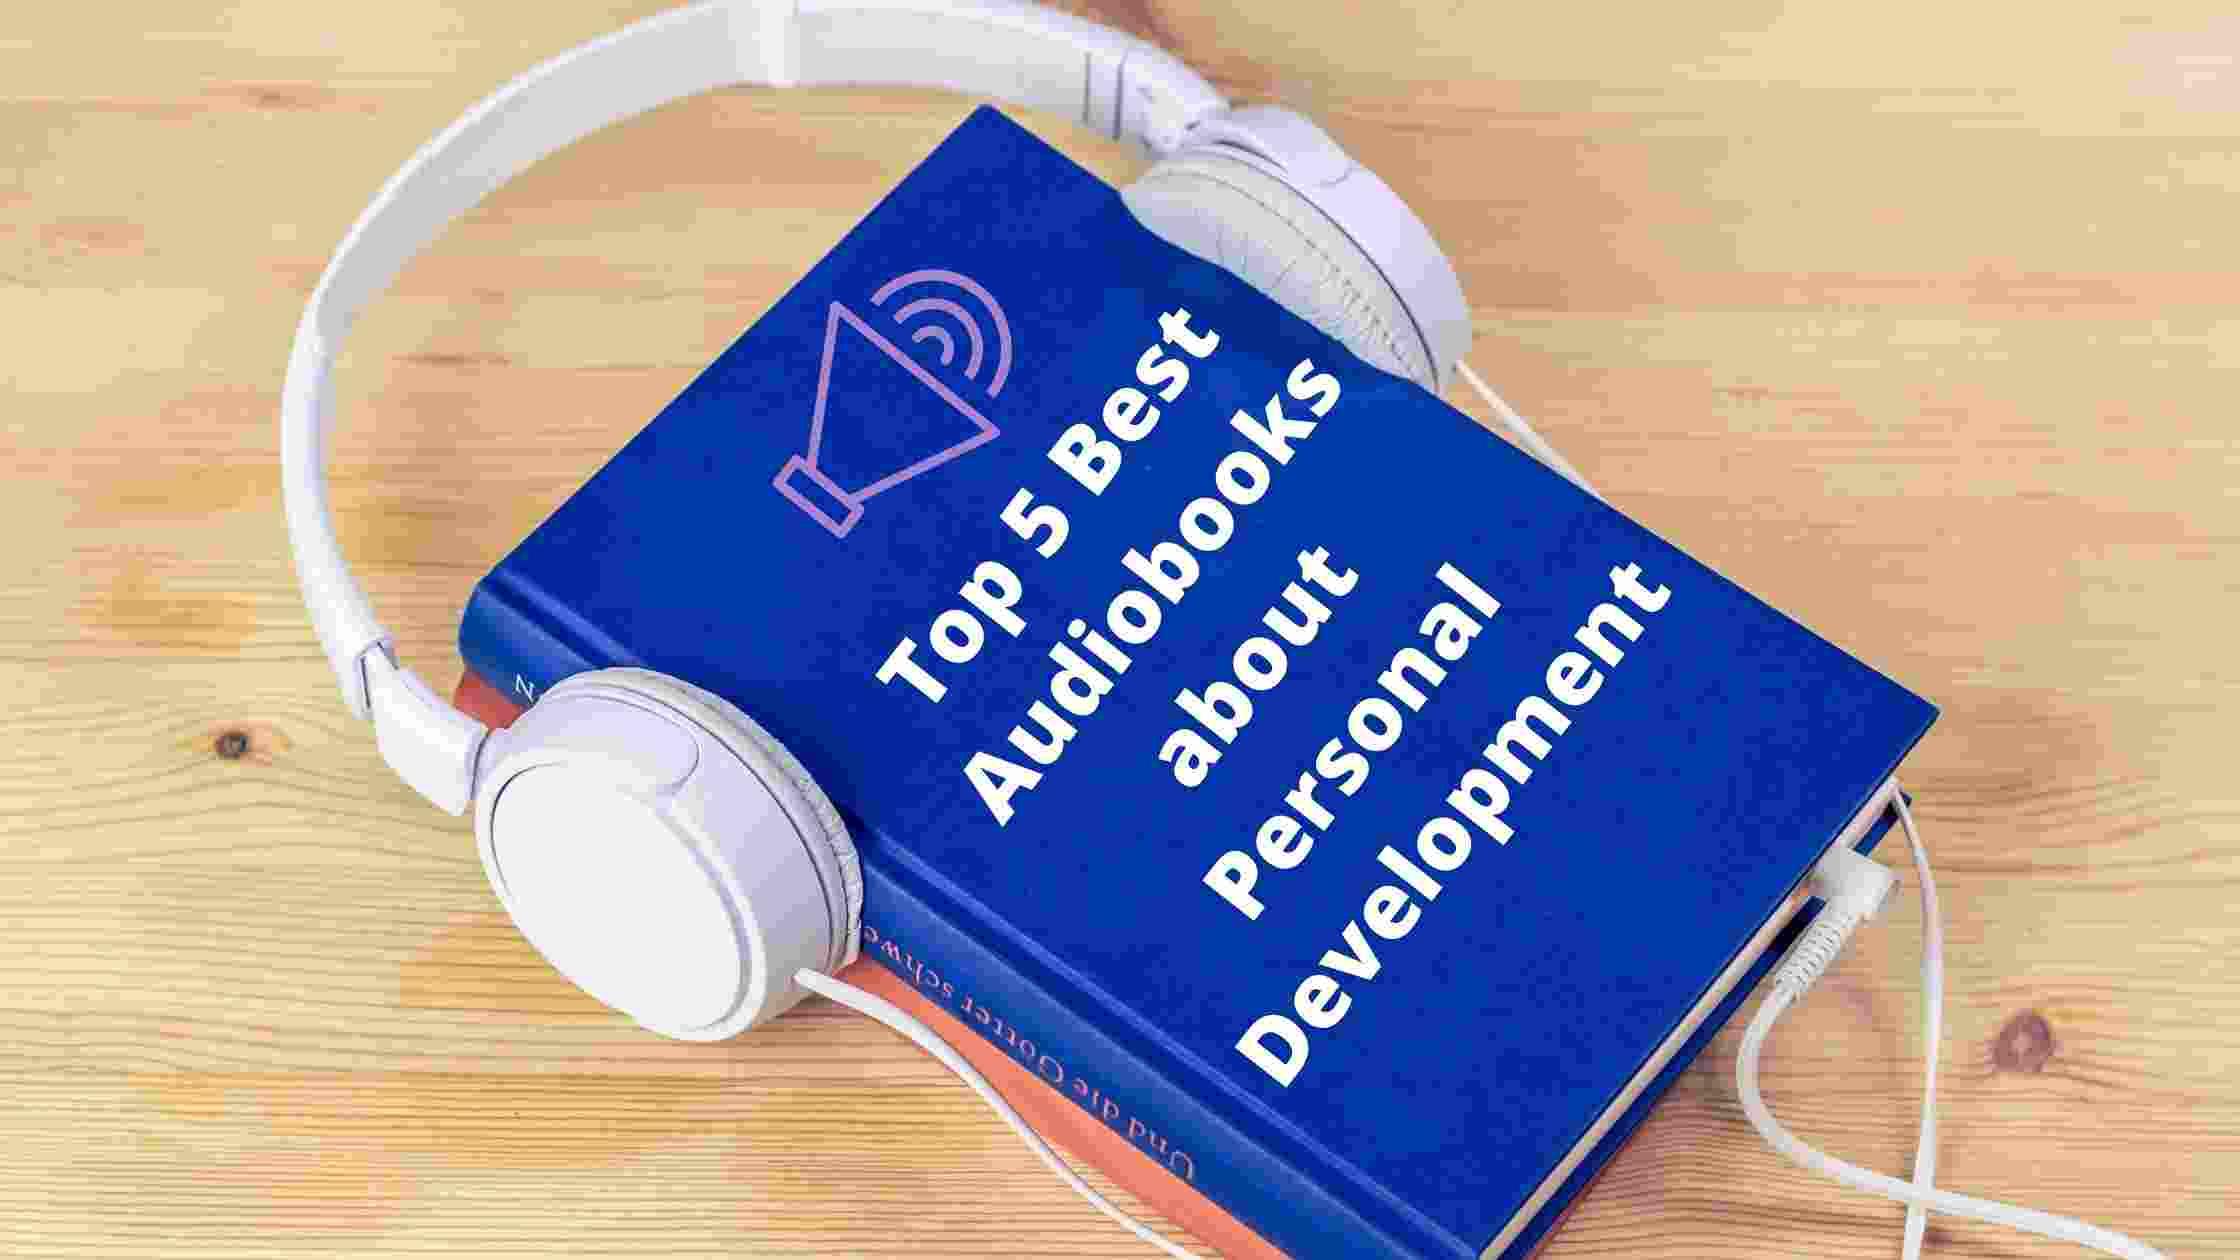 Top 5 Best Free Audiobooks About Self Development